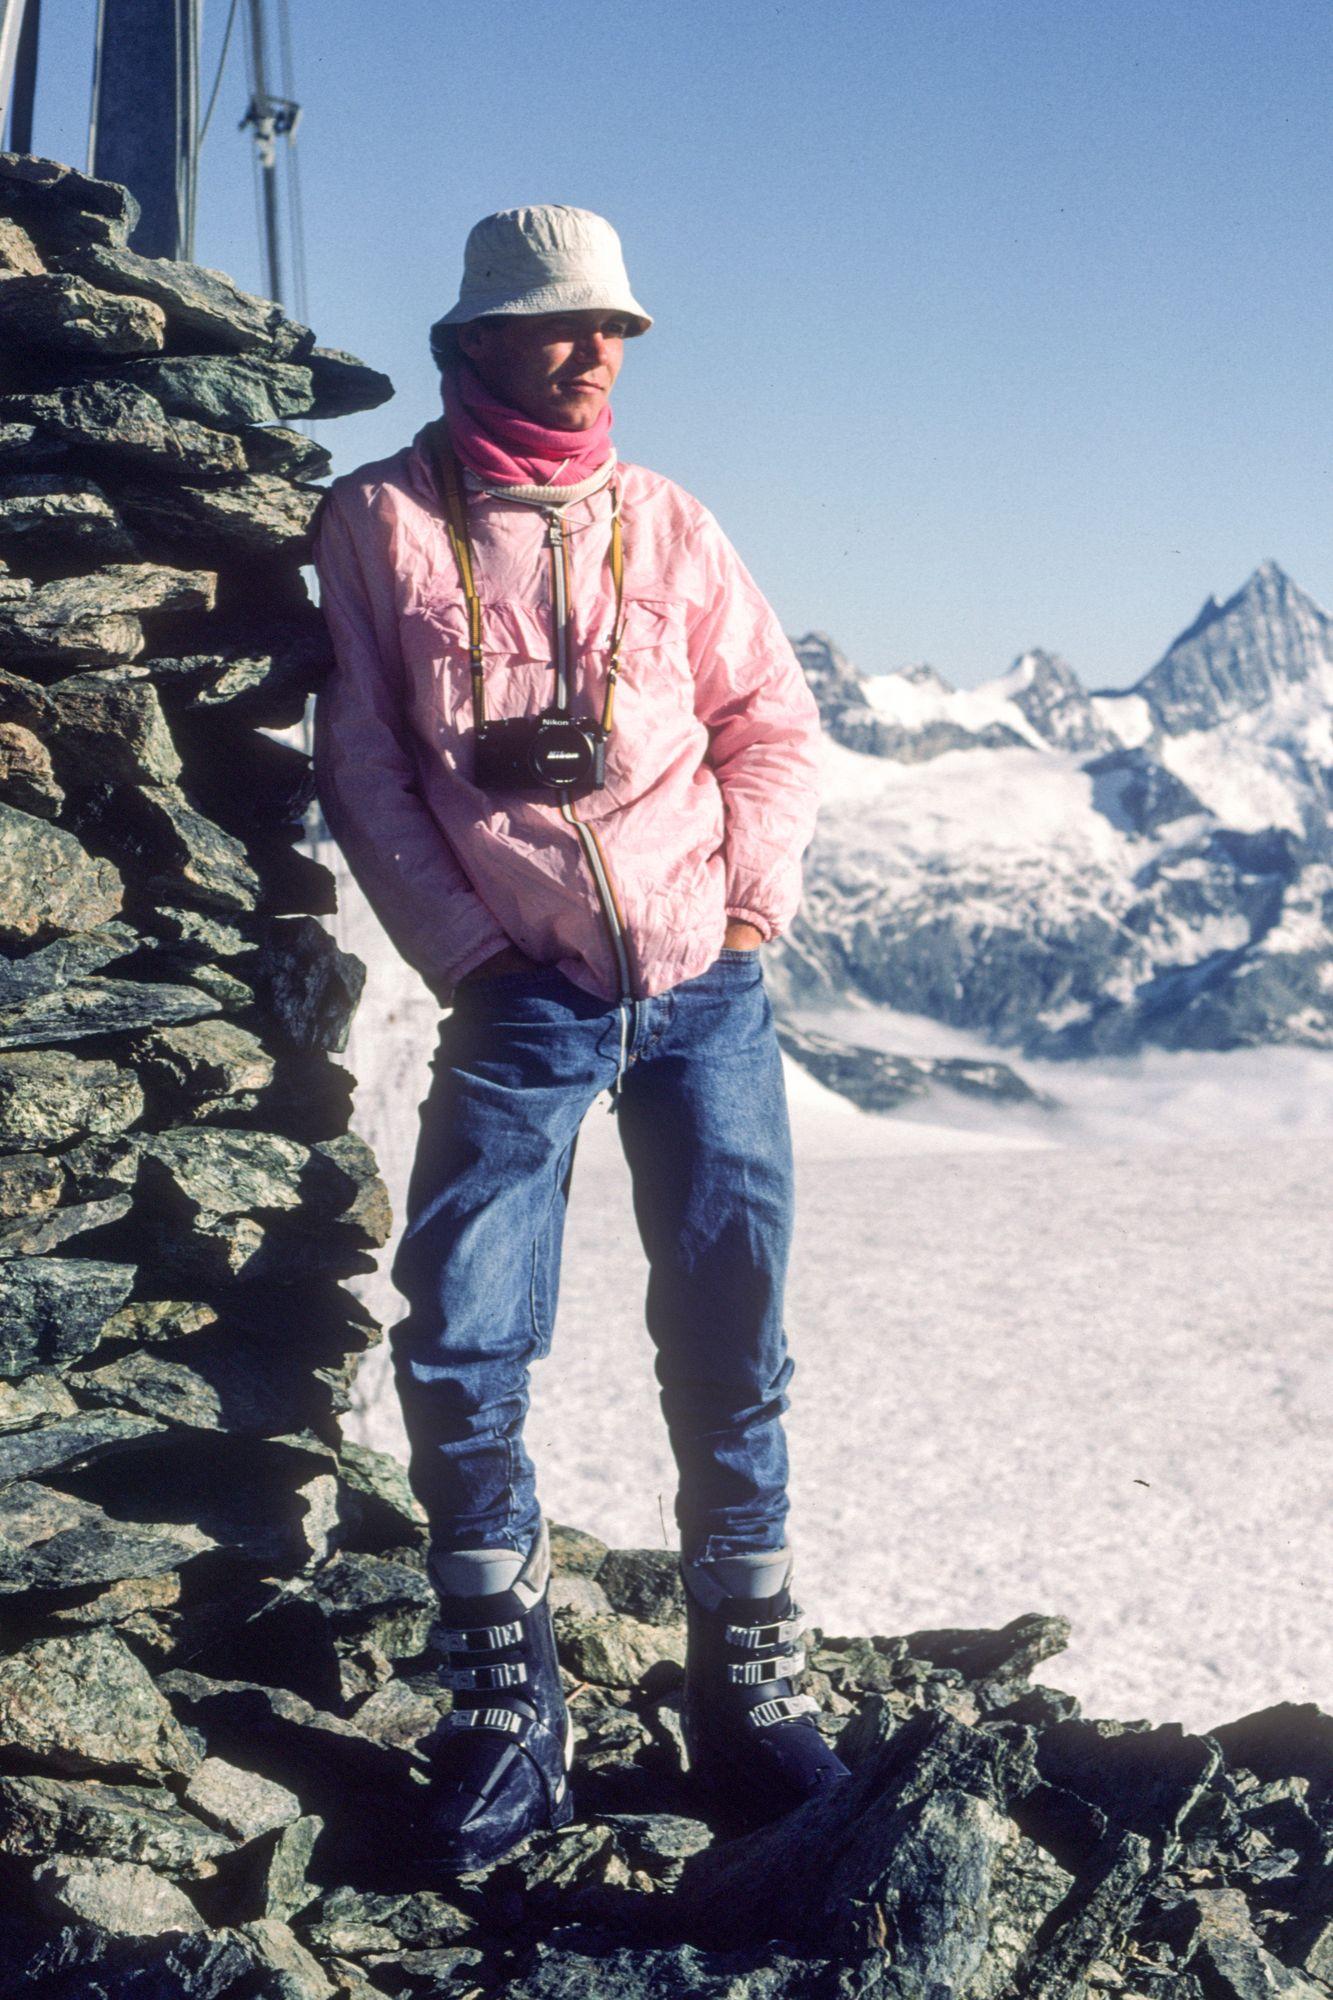 Fotograf Svend Krumnacker 1984 Nikon FM 2 16mm/2.8 Fisheye